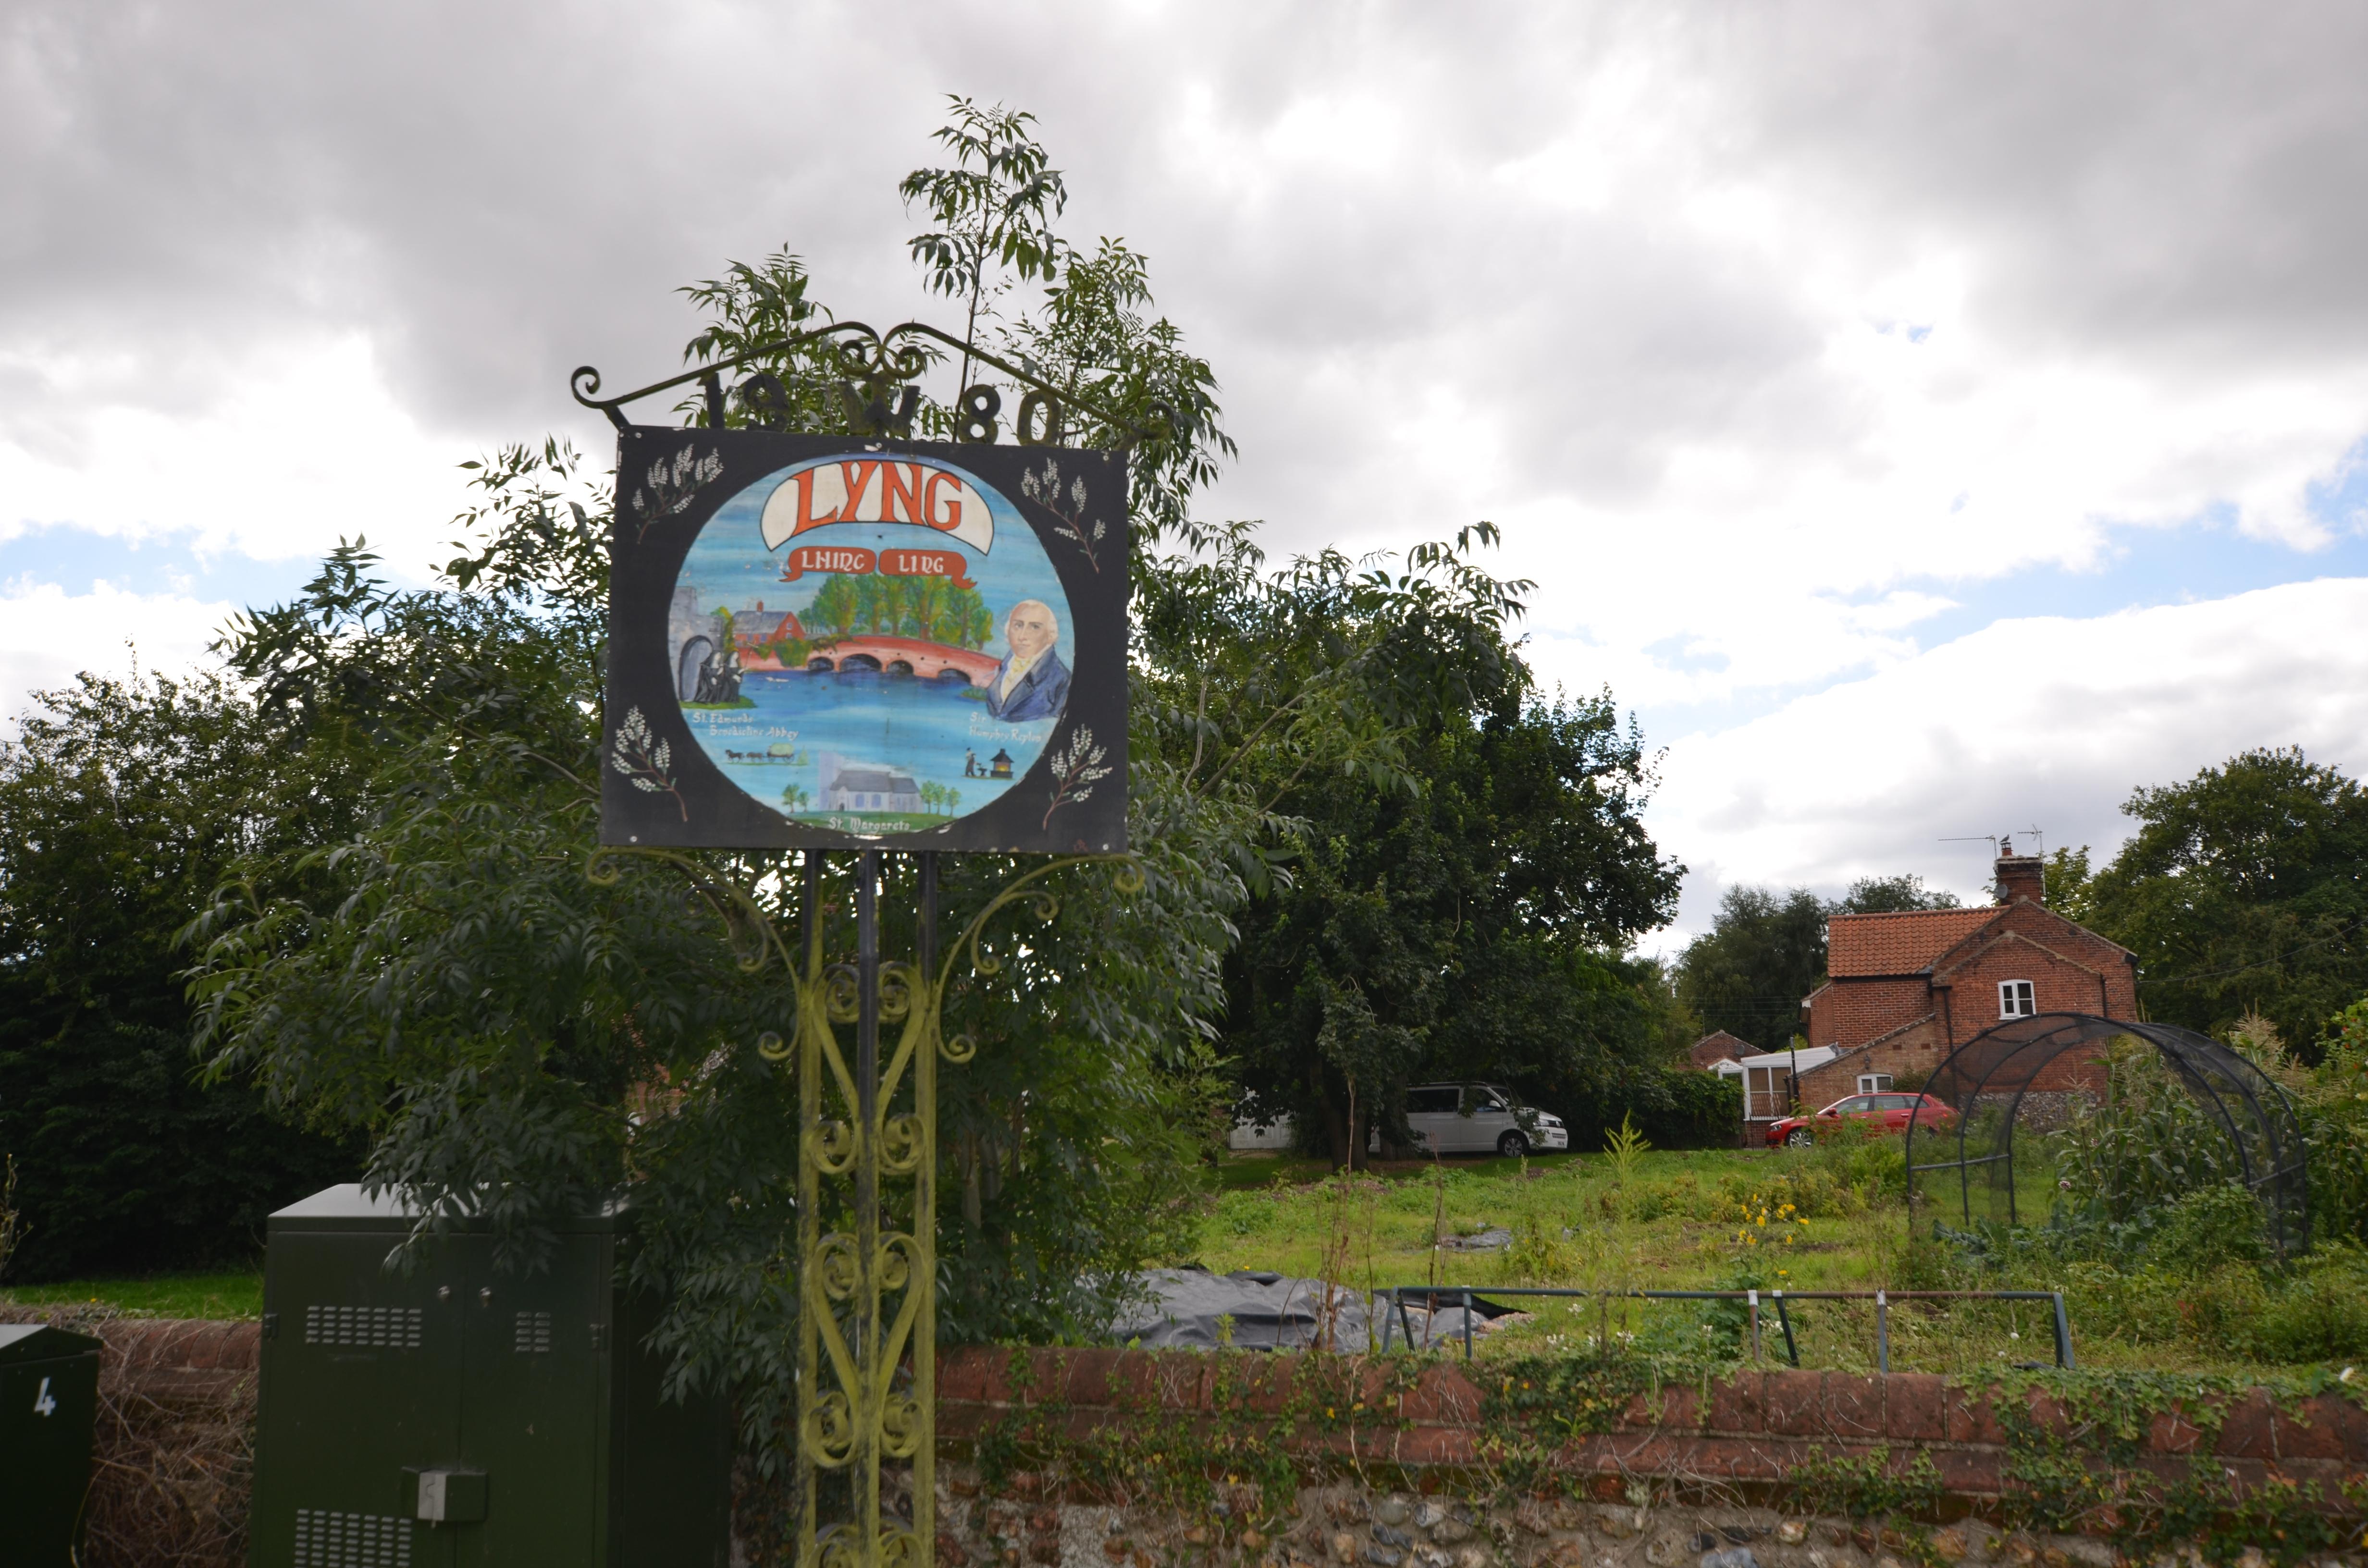 Lyng village sign